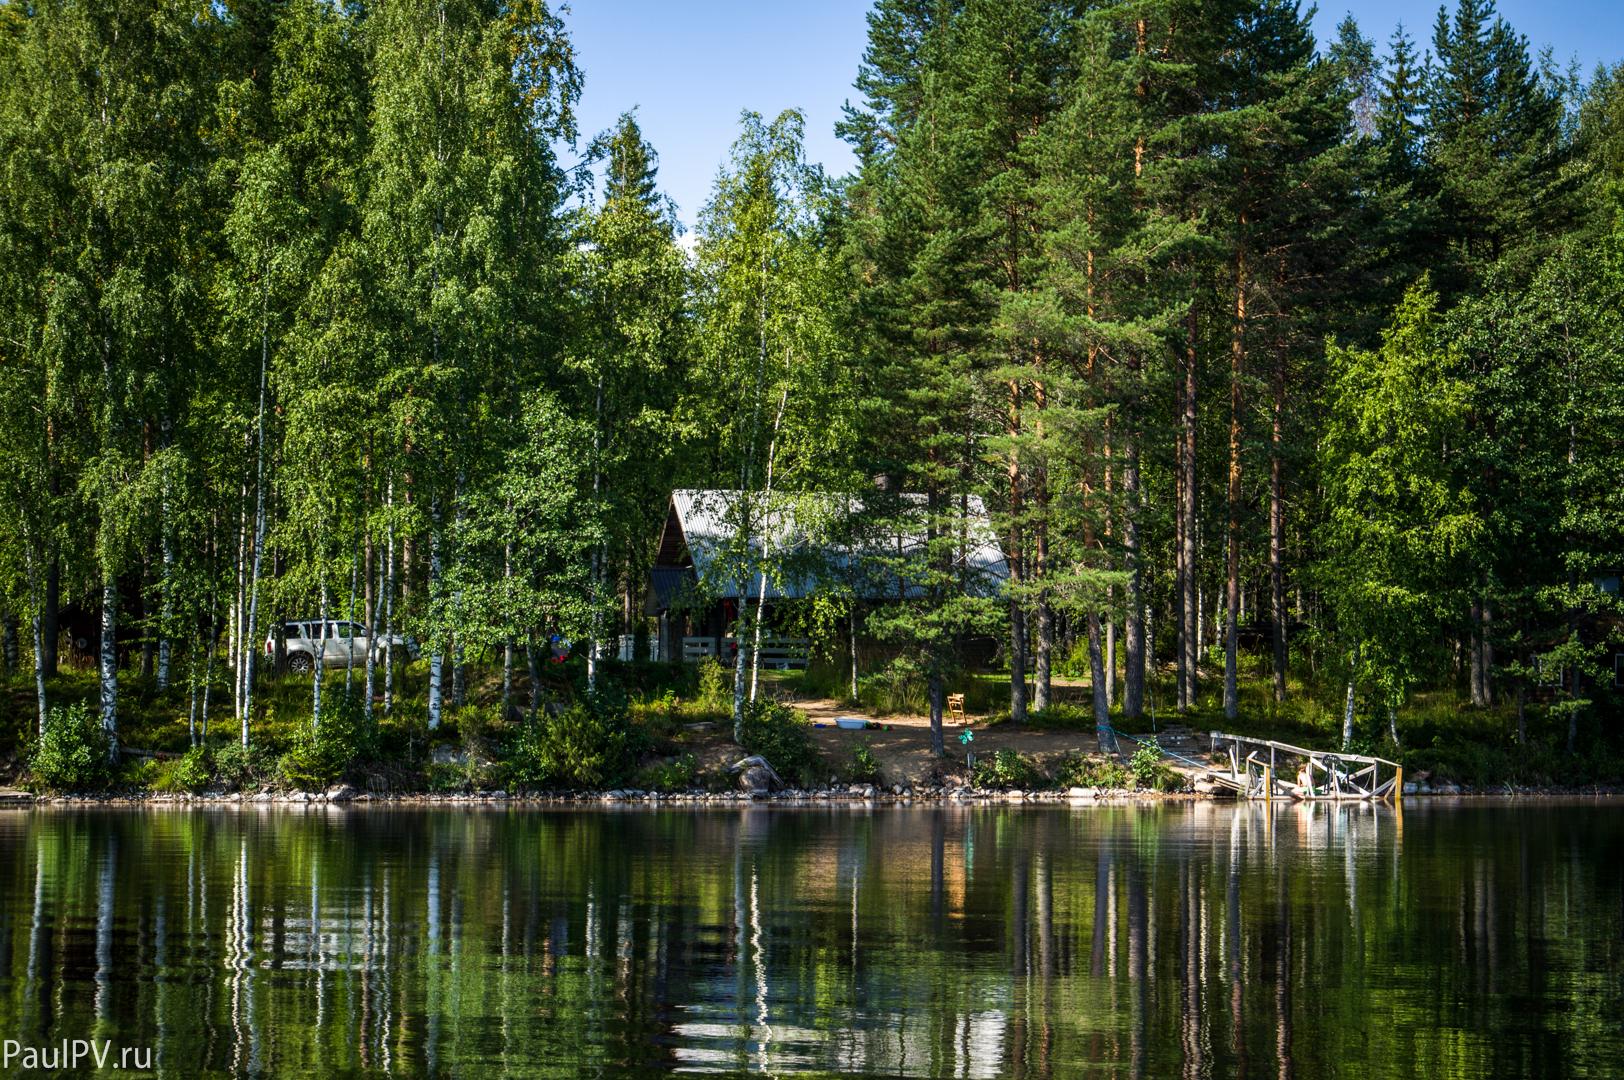 Финляндия, Suomi, Finland, PaulPV